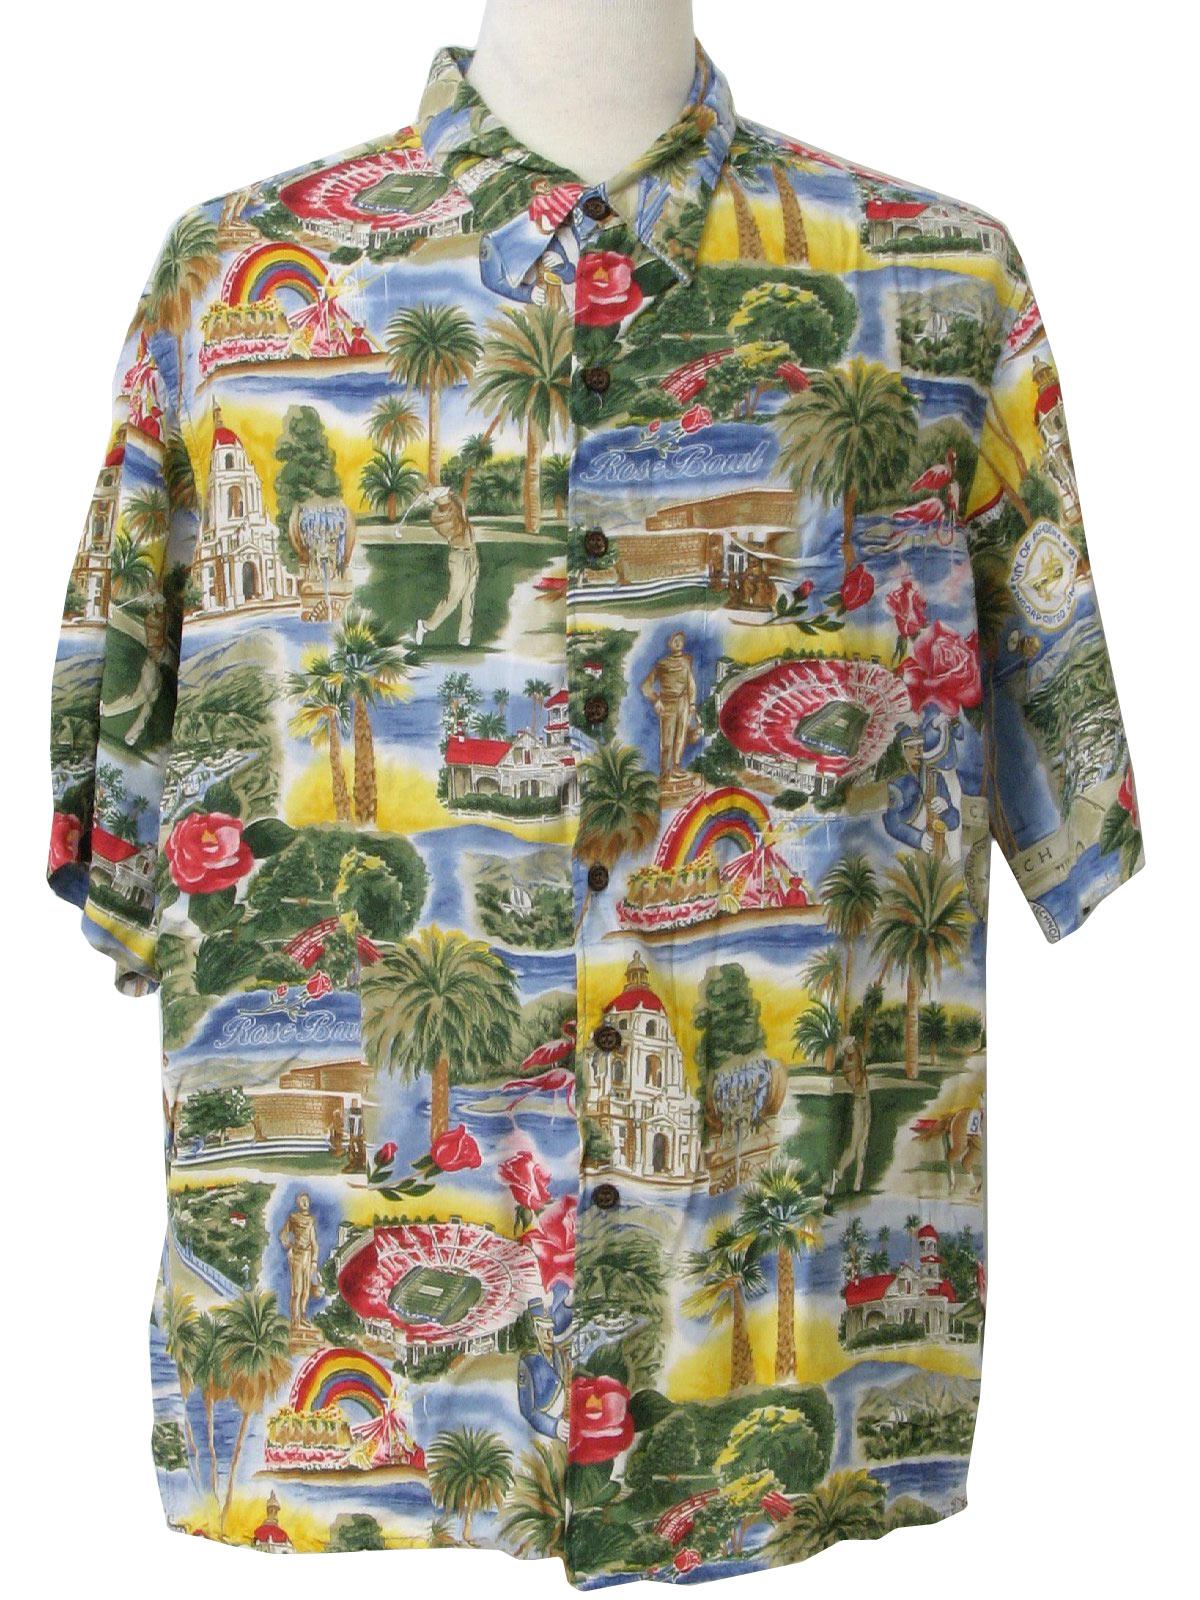 7dfd4b07 Retro Eighties Hawaiian Shirt: Late 80s or early 90s -Reyn Spooner ...